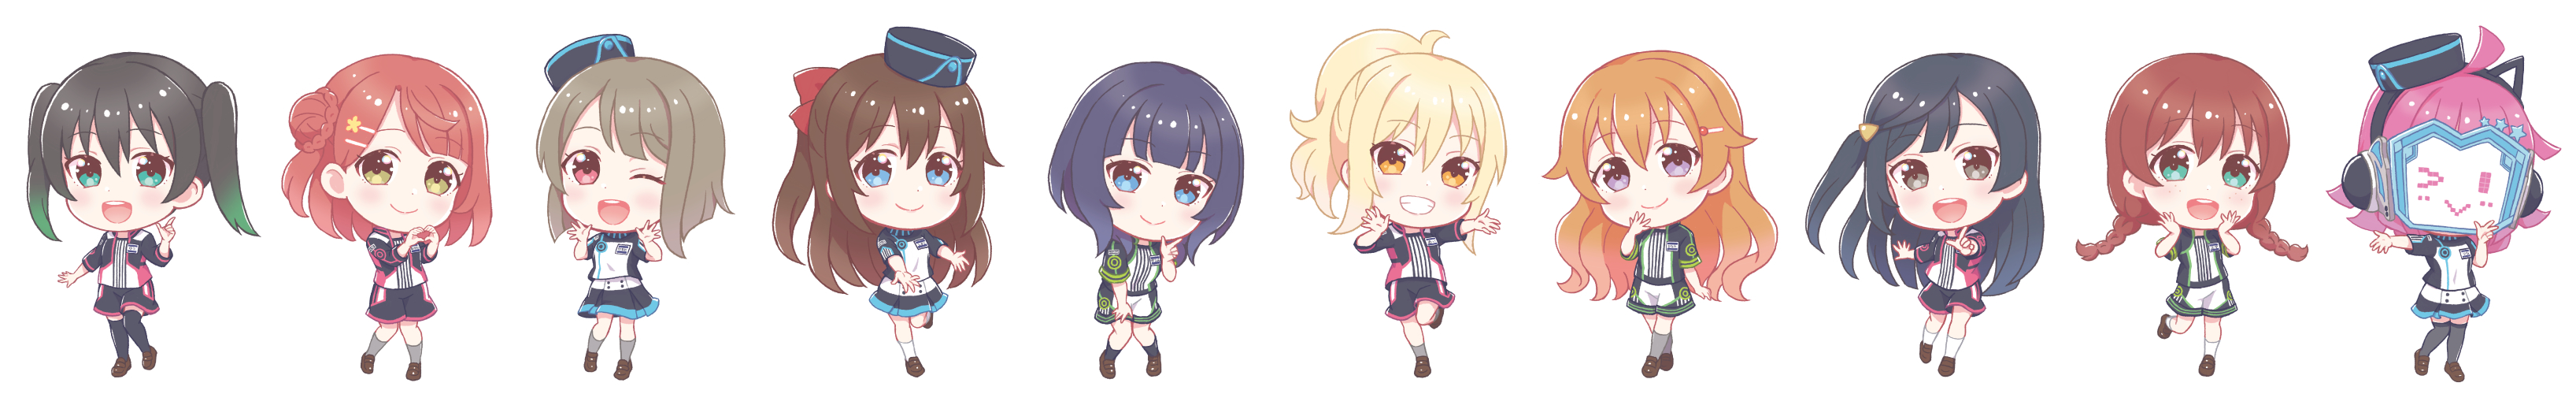 (c) 2020 プロジェクトラブライブ!虹ヶ咲学園スクールアイドル同好会